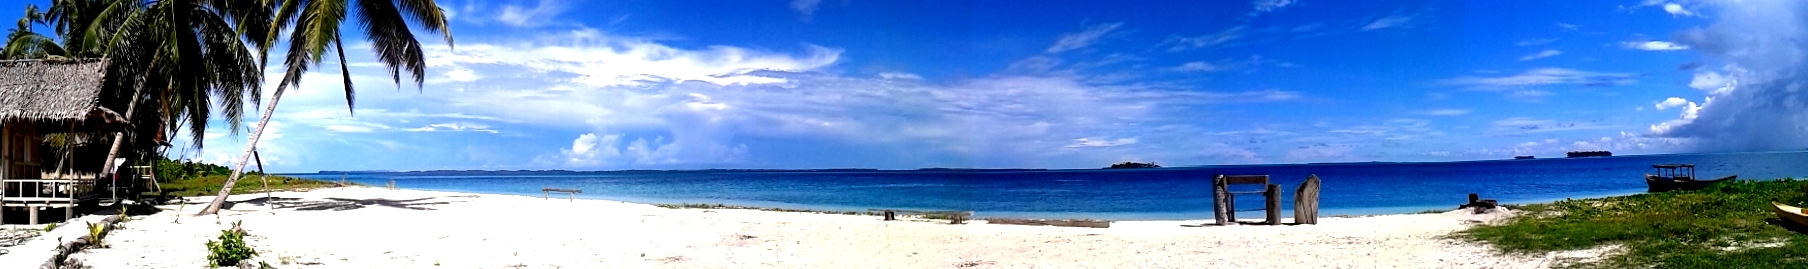 Banyak Islands – Travel guide at Wikivoyage